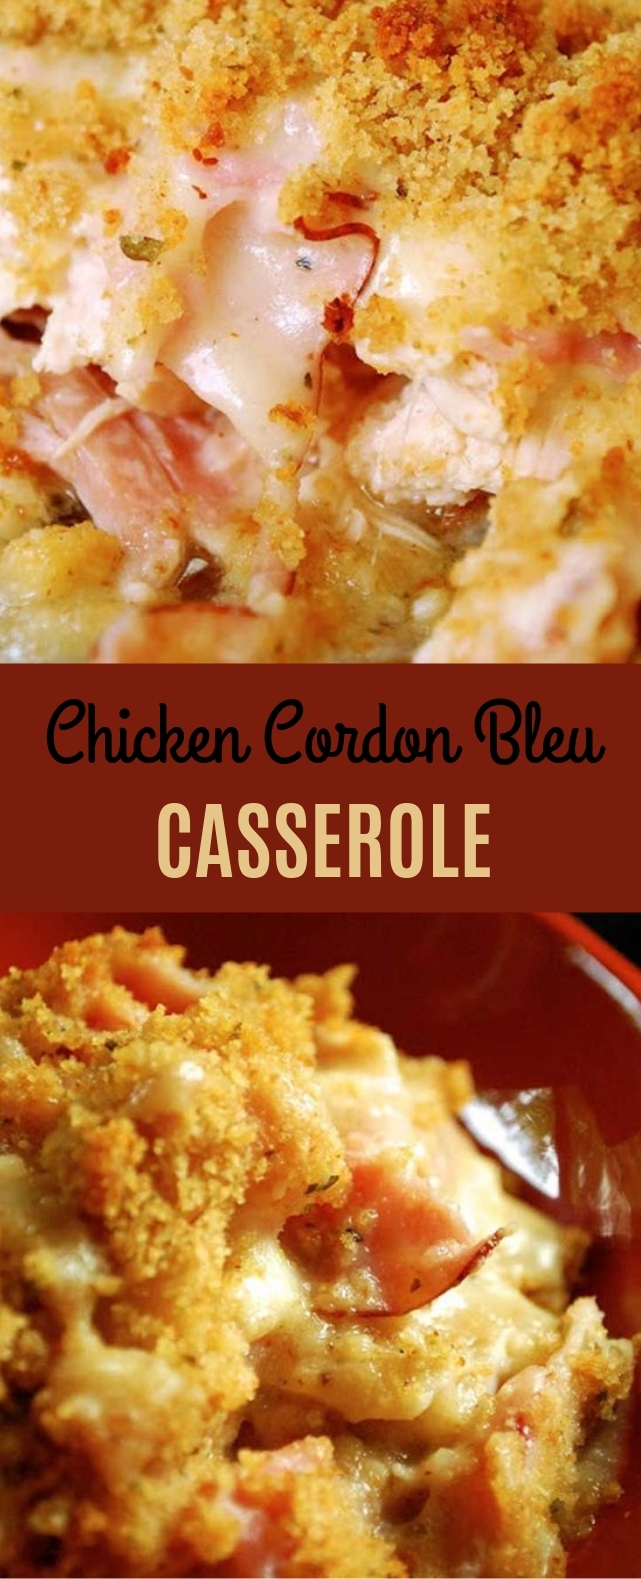 Chicken Cordon Bleu Casserole #chicken #dinner